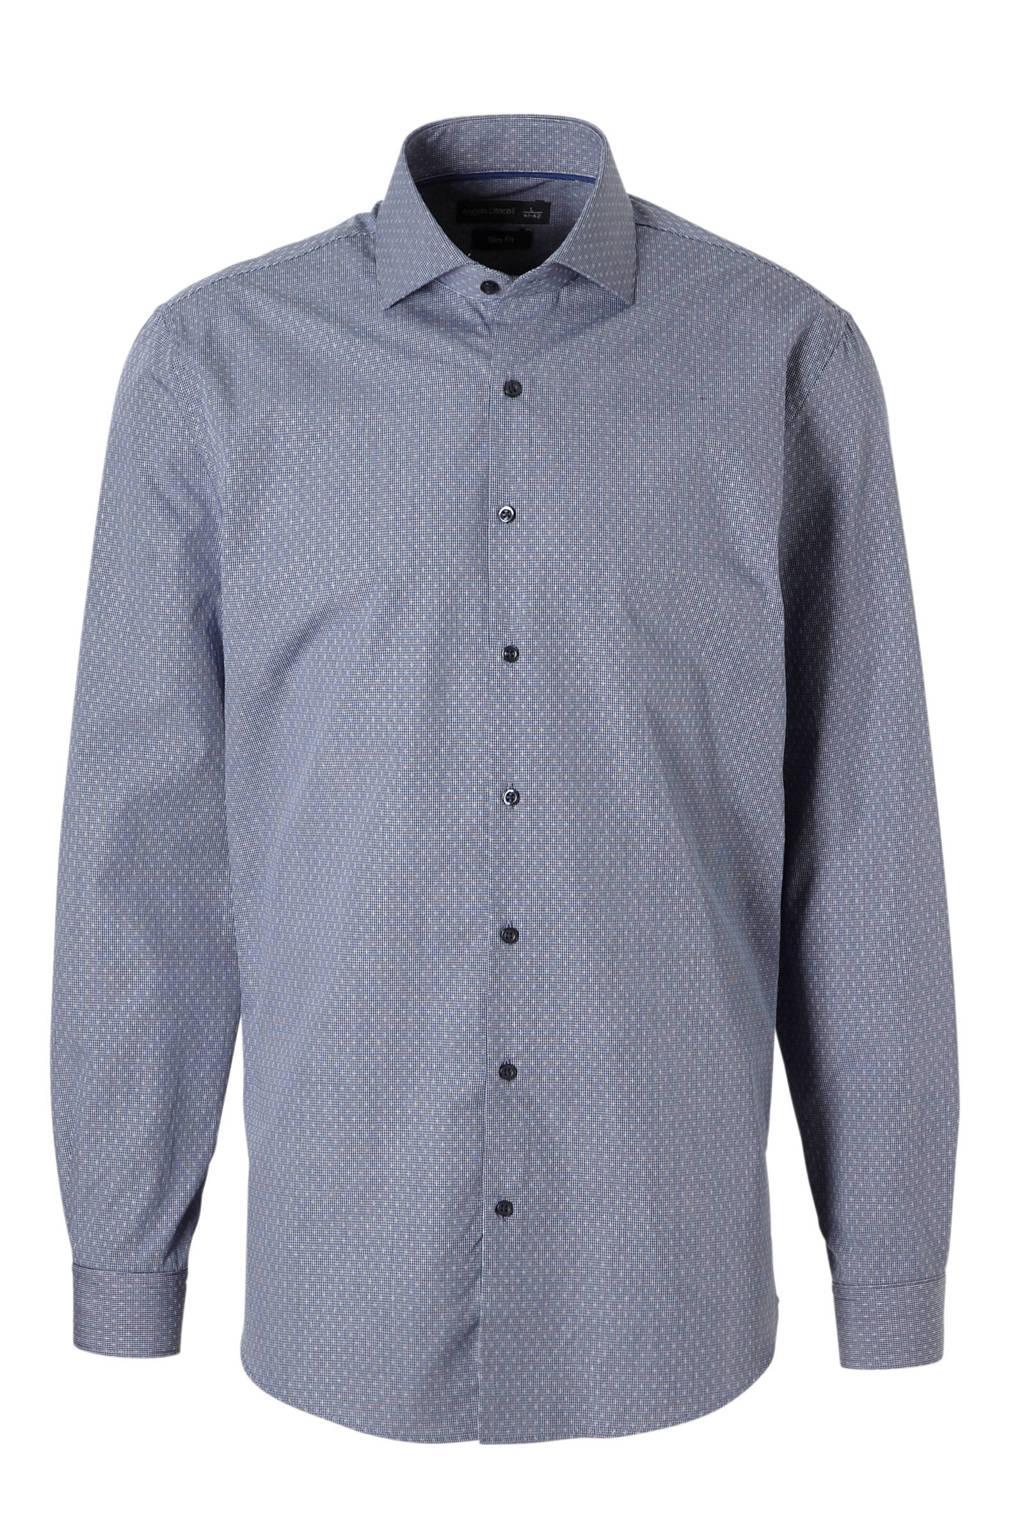 C&A Angelo Litrico slim fit overhemd met print blauw, Blauw